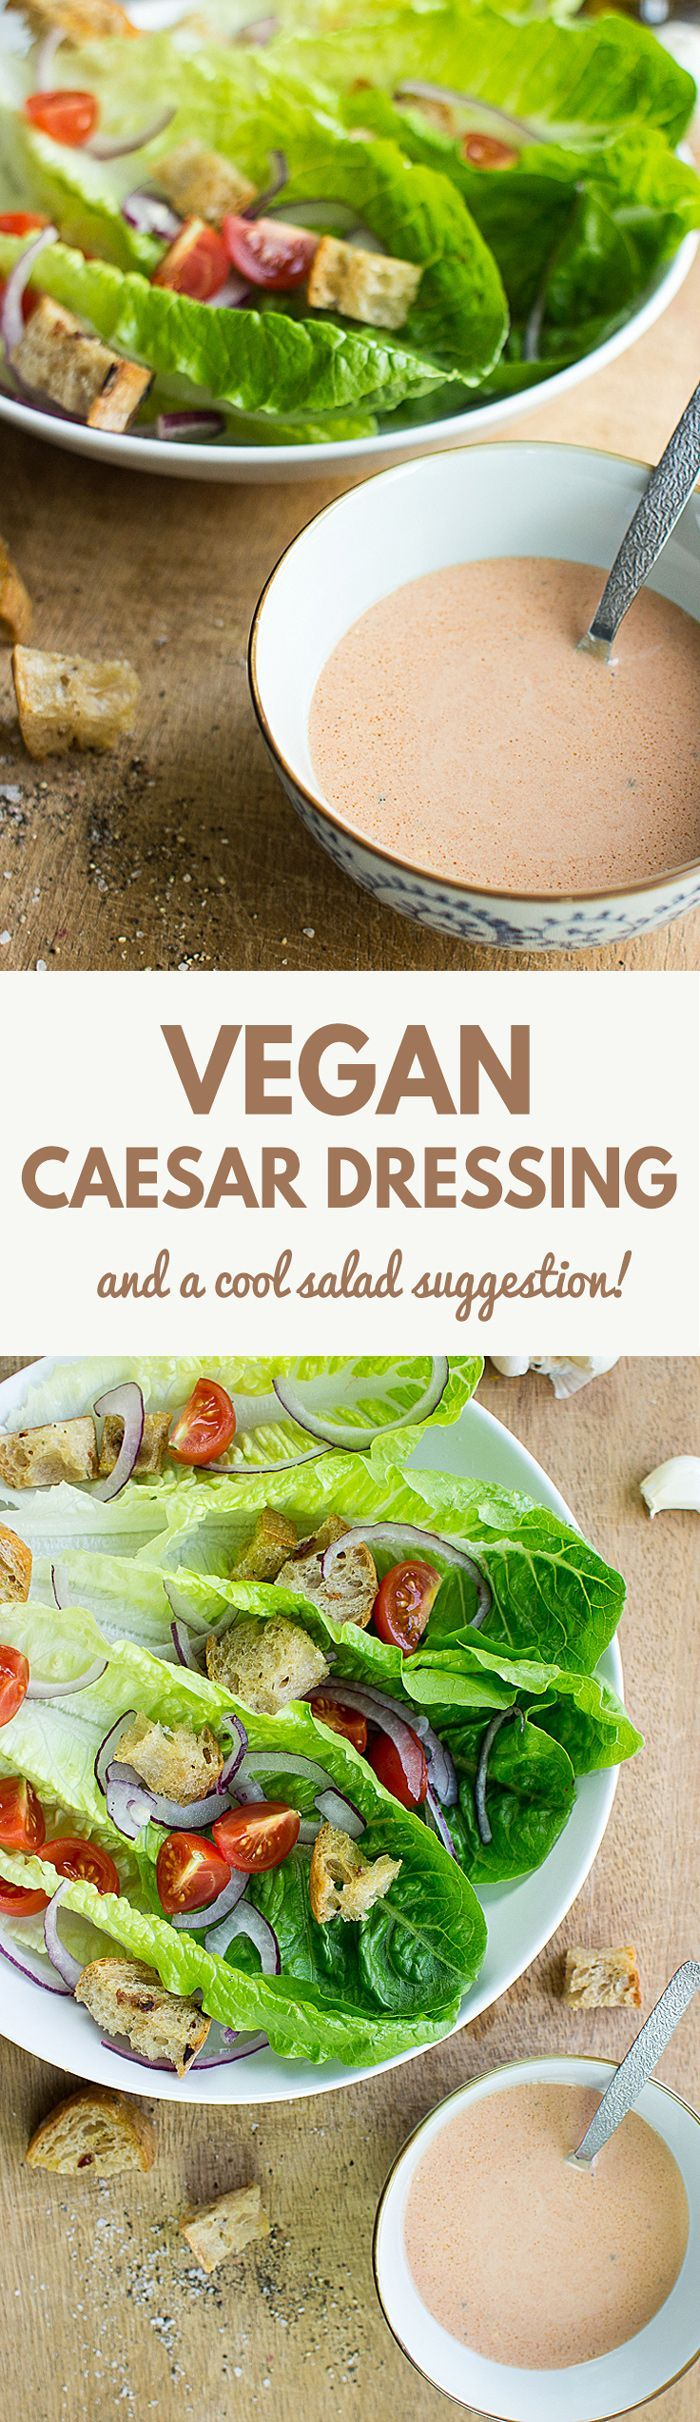 Vegan Caesar Dressing (and a cool salad suggestion!) | http://hurrythefoodup.com